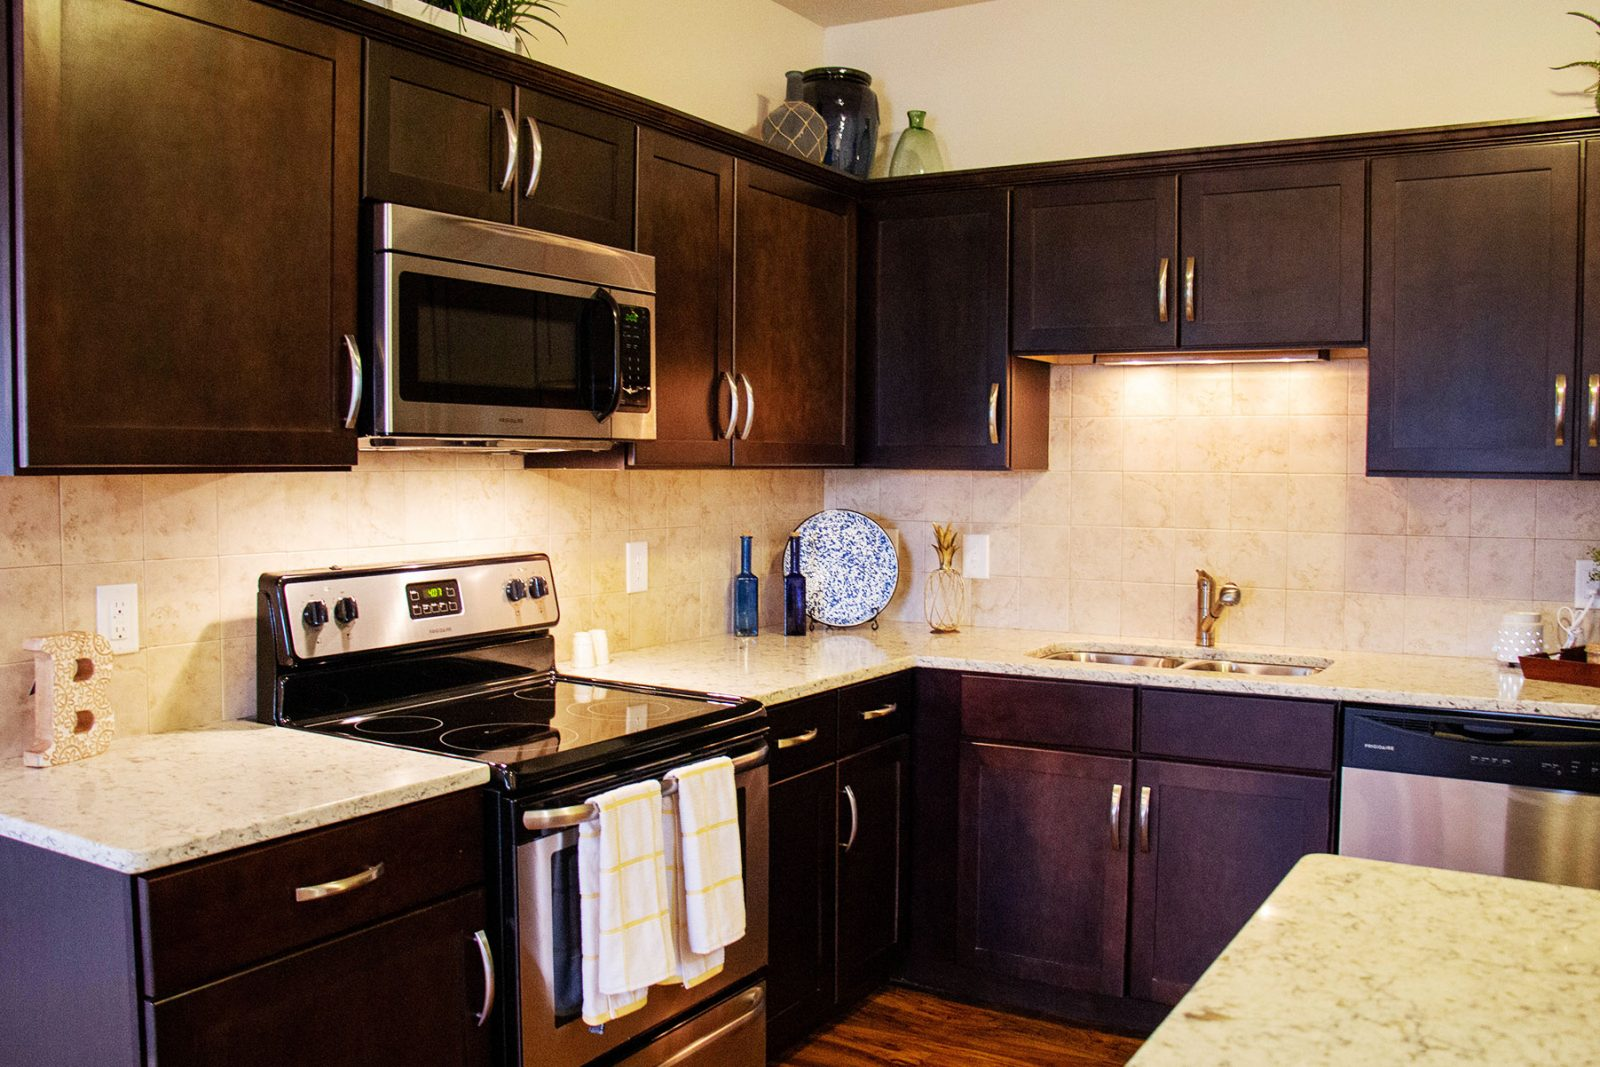 Stainless steel refrigerator, dishwasher, stove and quartz kitchen countertops